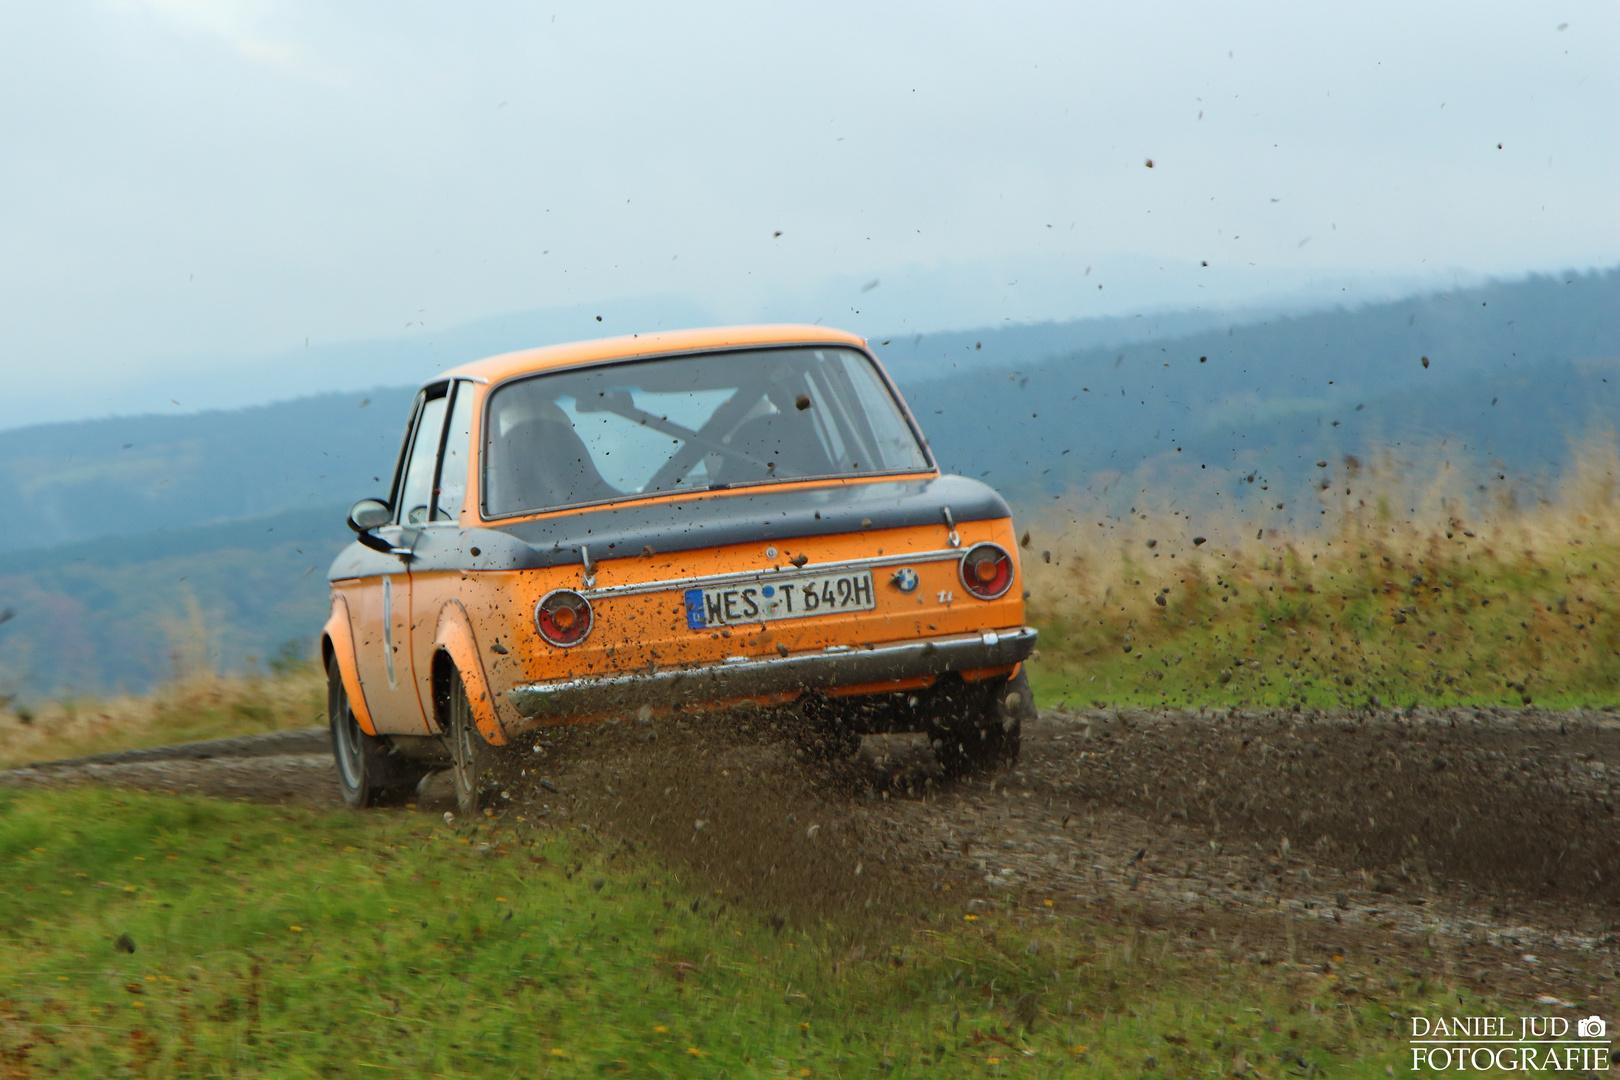 BMW 2002 ti - ADAC Rallye Siegerland-Westerwald -